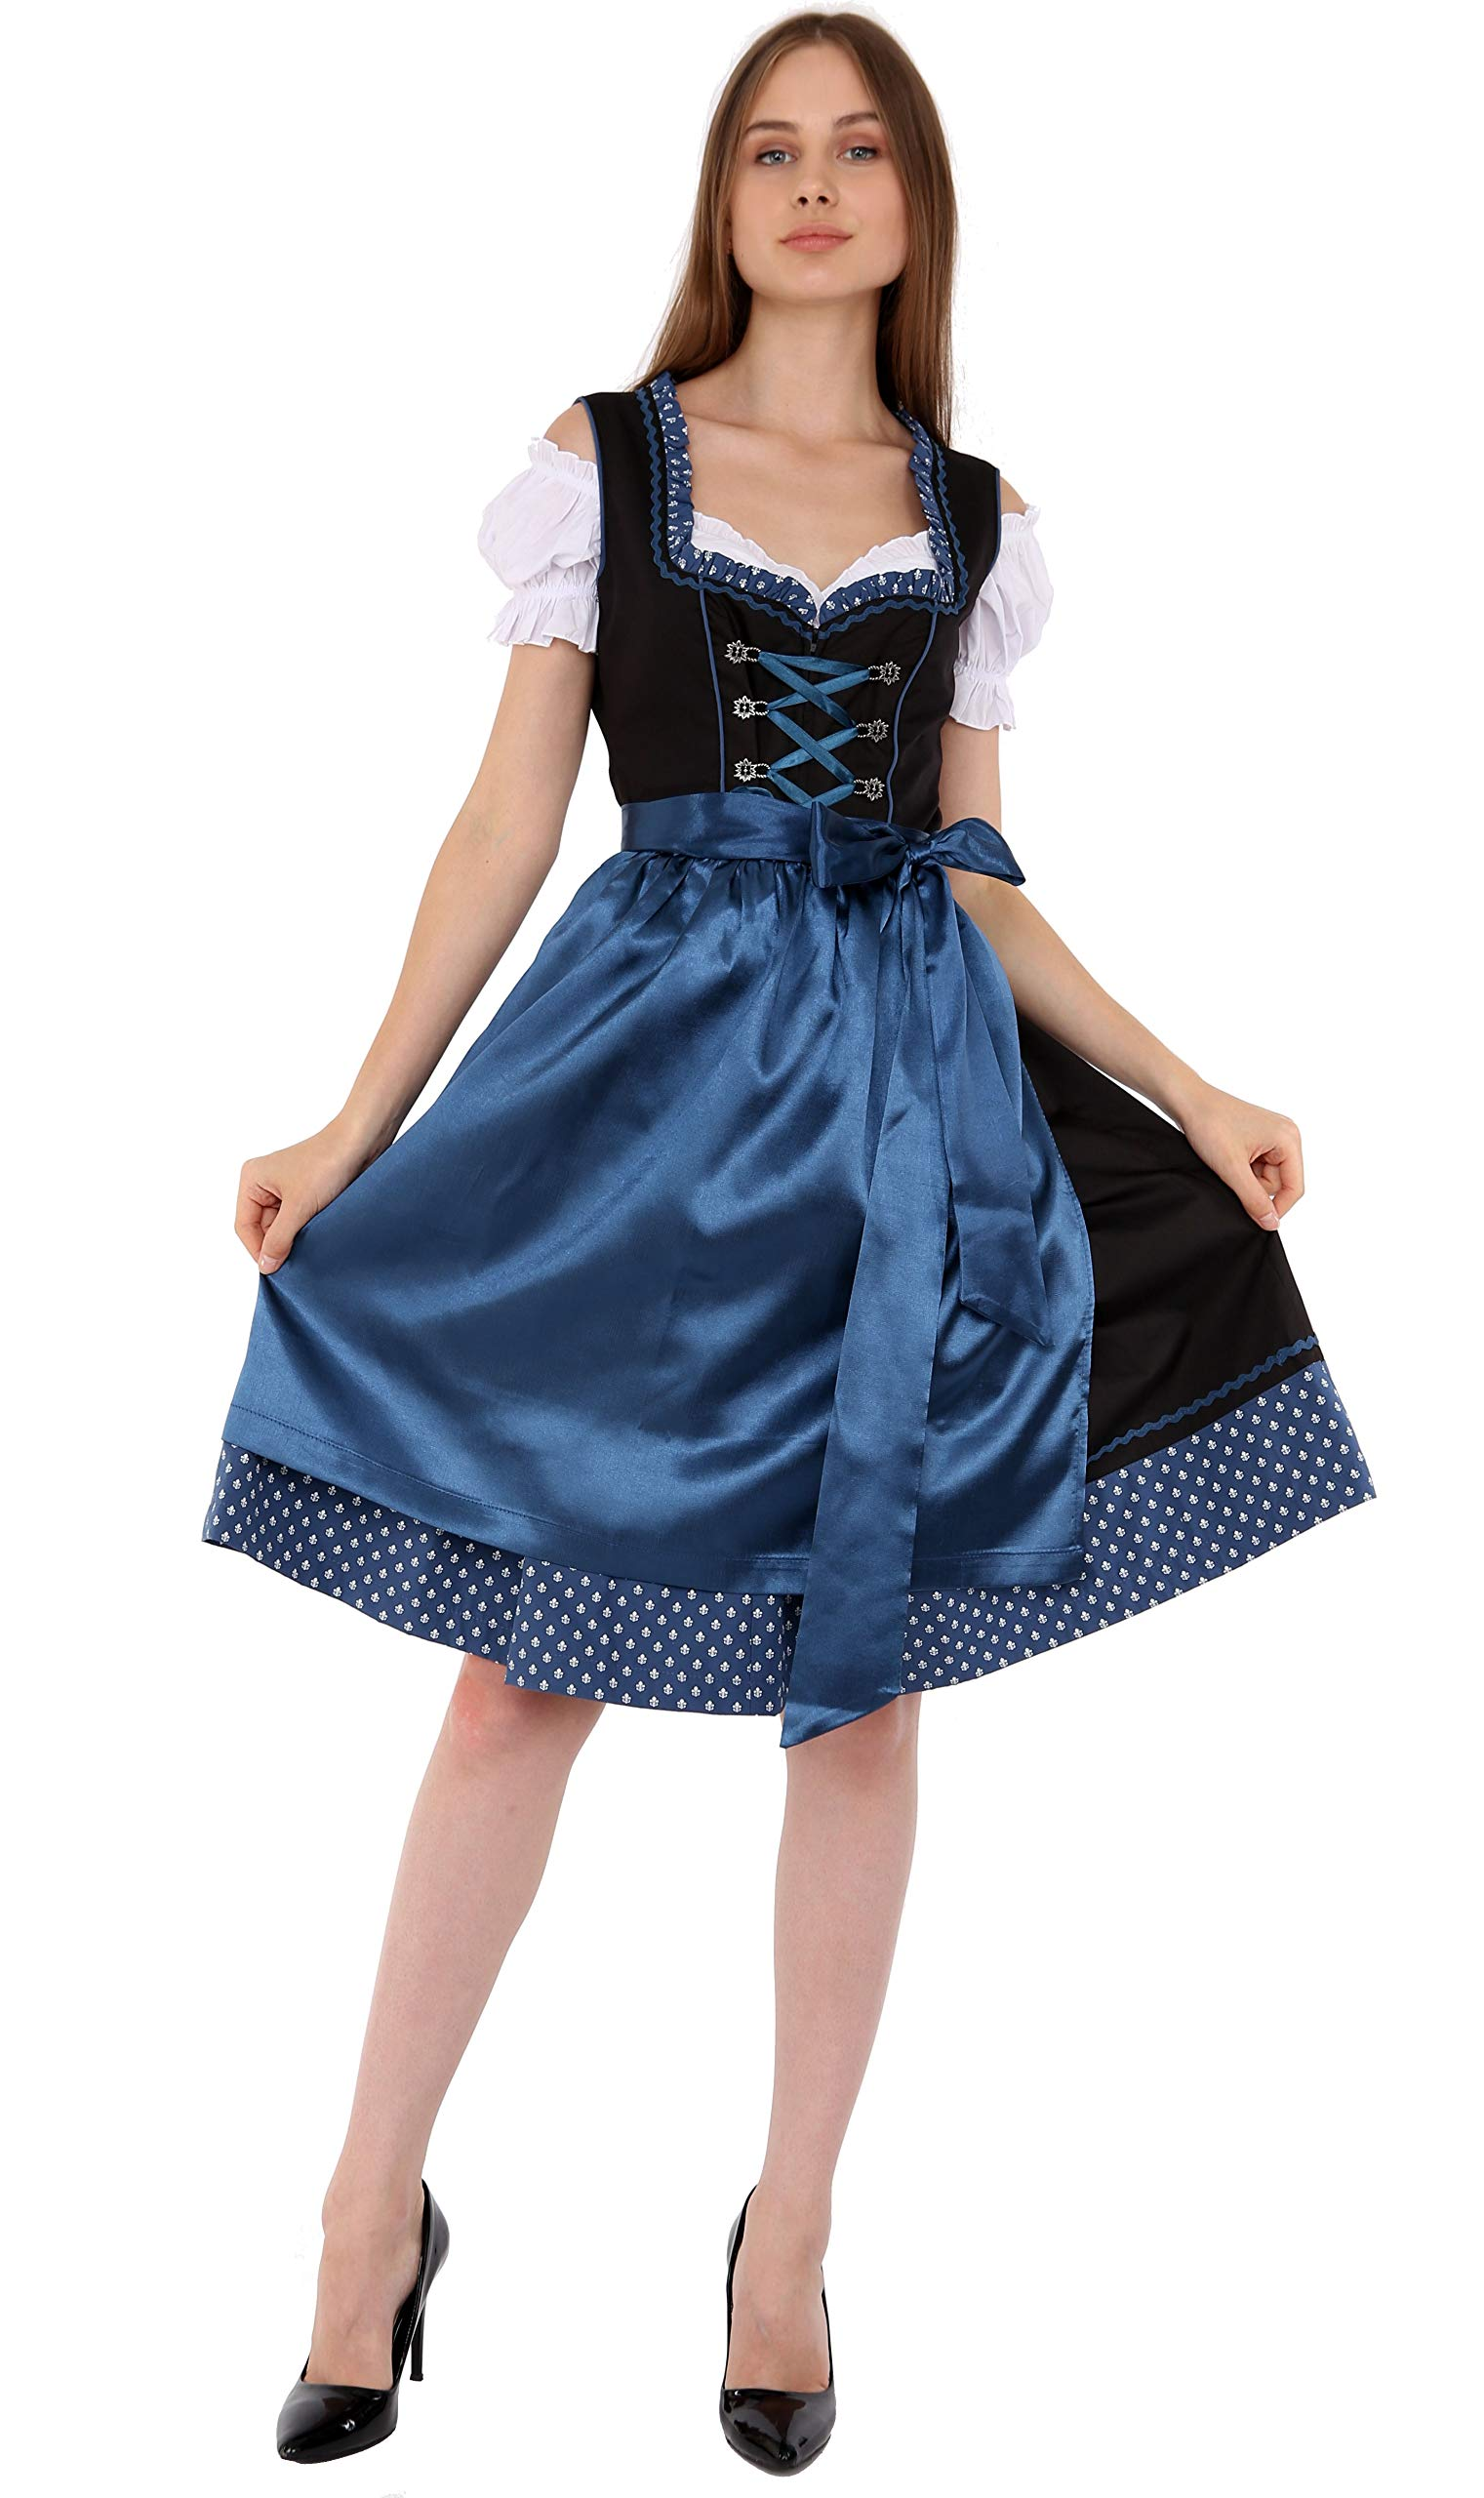 01302 Dirndl 3Pcs Oktoberfest German Dress - Available Sizes: 36.38.40.42.44.46.48.50.52 (48) Blue by LfS